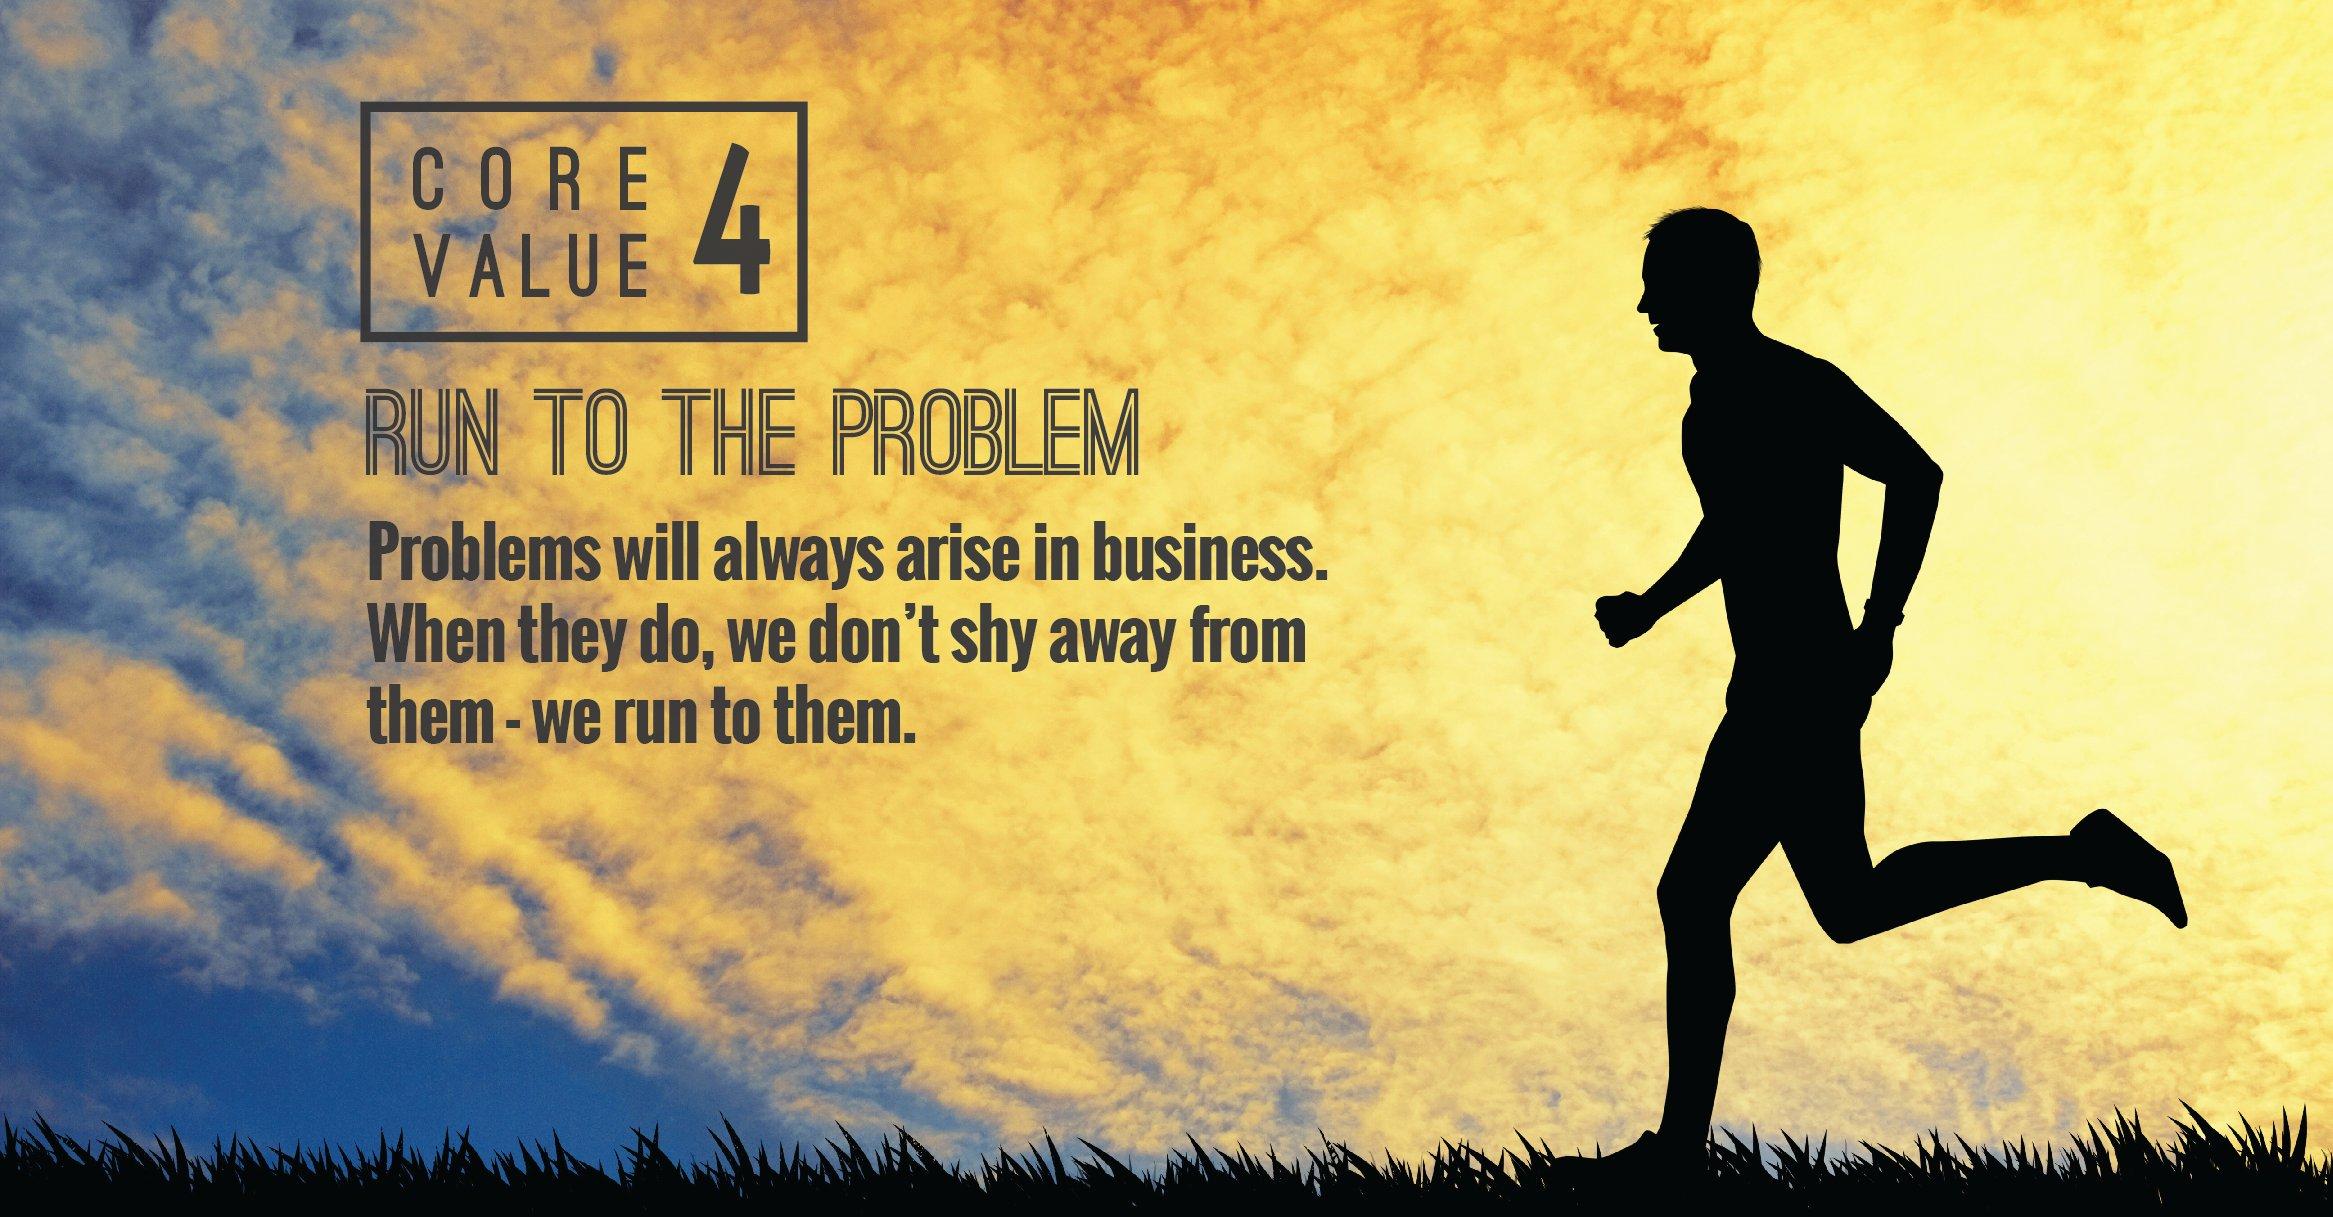 Core_Value_4_-_Run_to_the_Problem-01.jpg